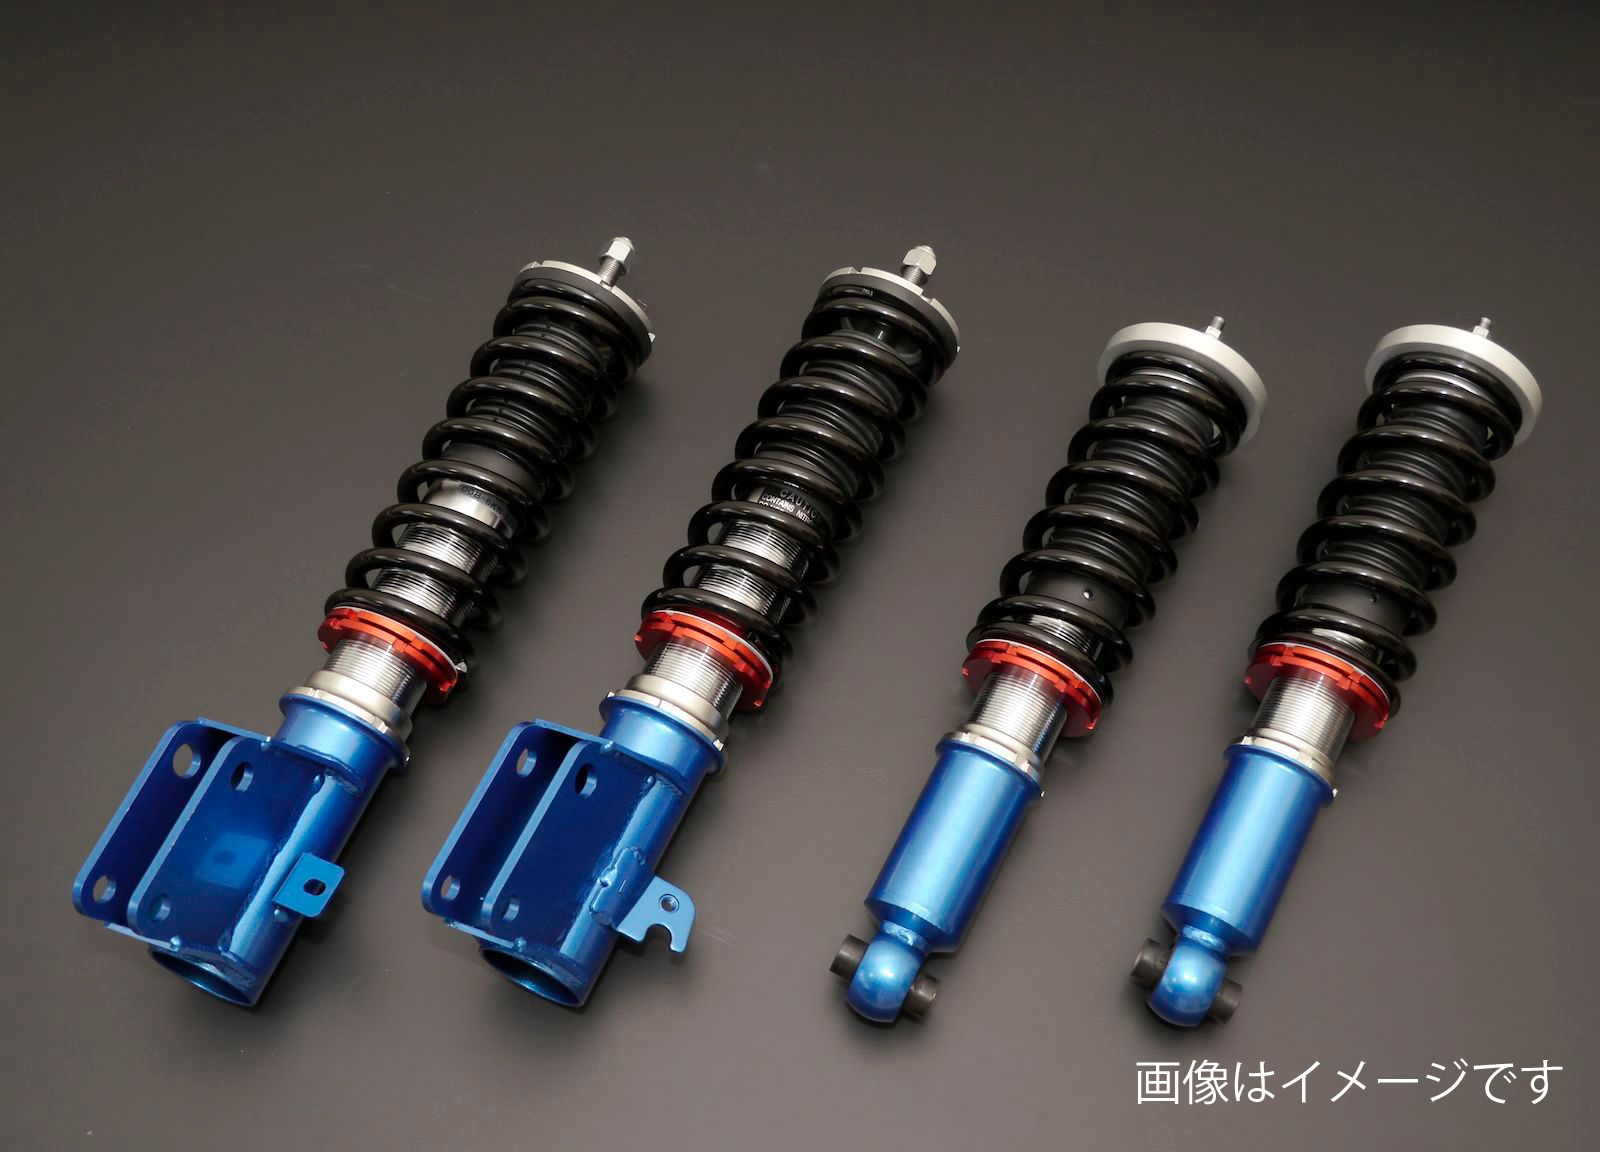 CUSCO(クスコ) 車高調キット street ZERO スバル インプレッサ GH2/GH8 2007.6-2011.12 商品番号:691 61P CN